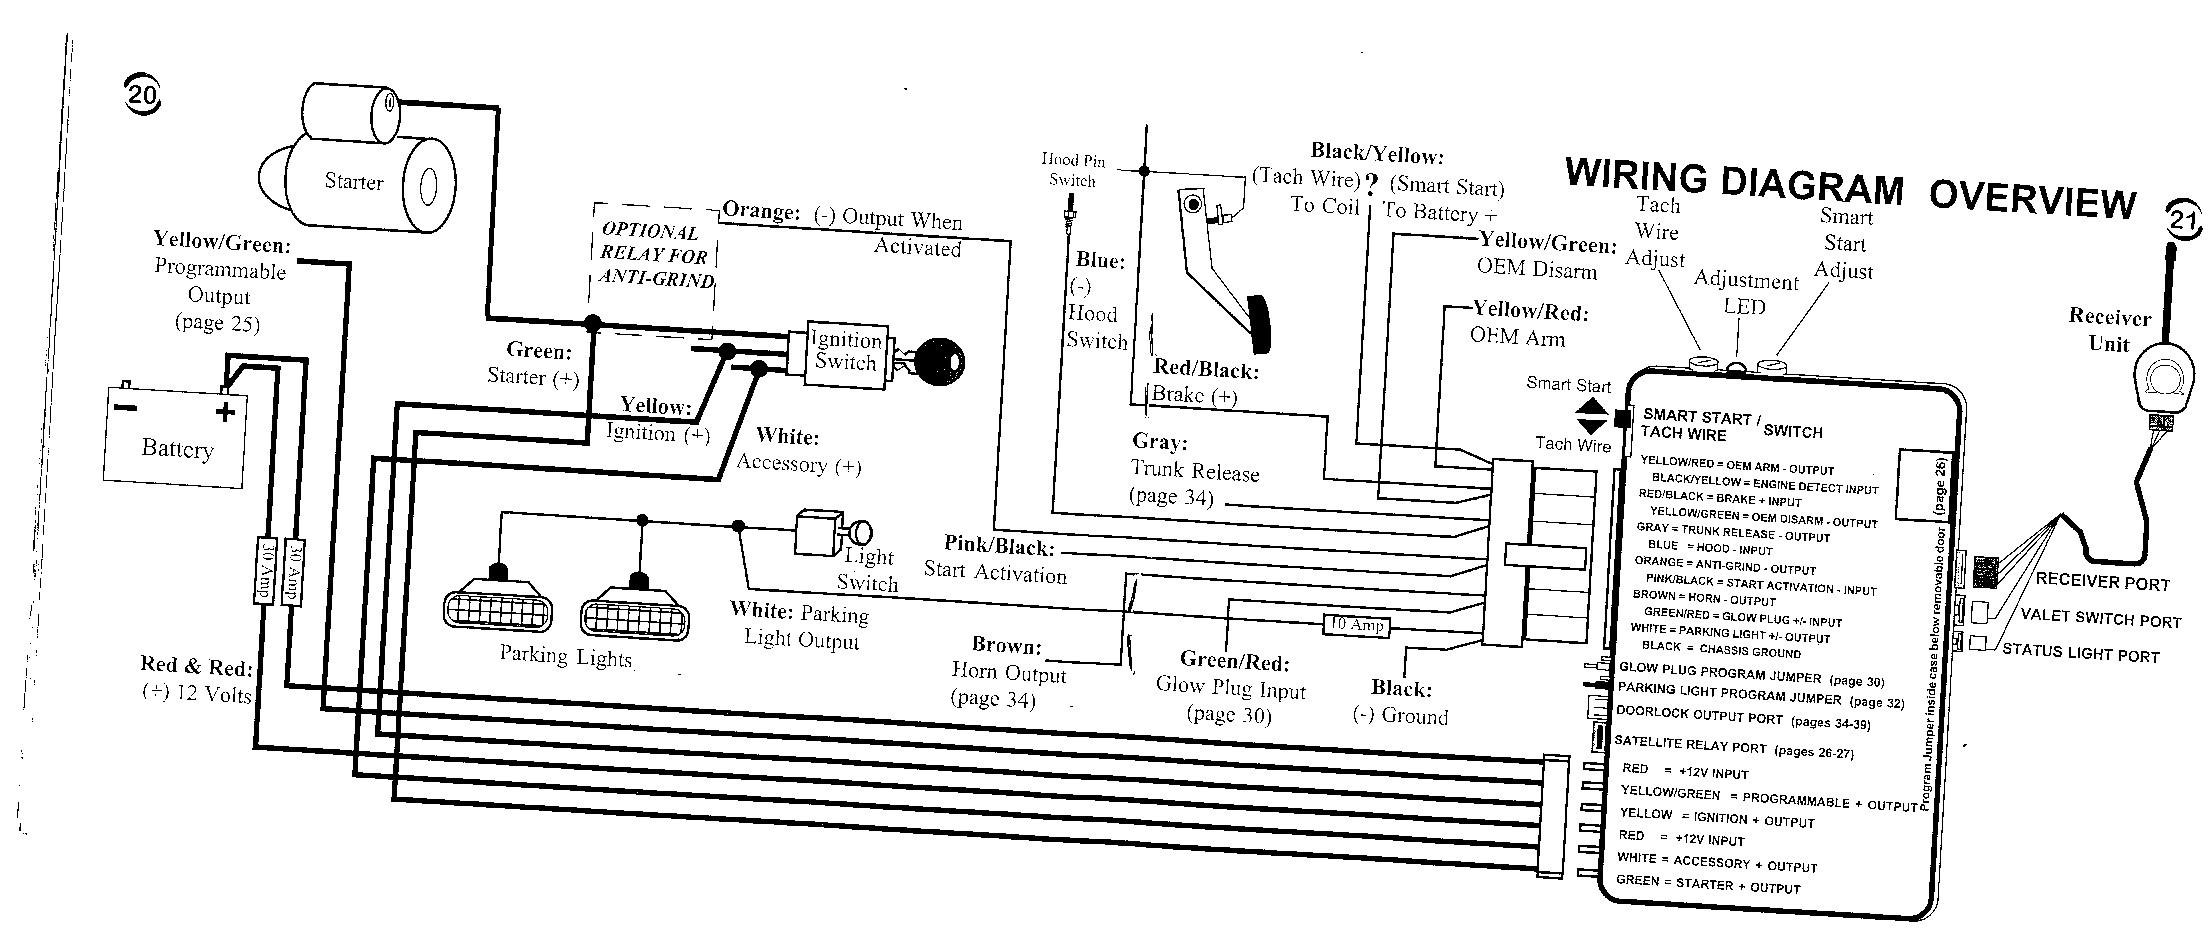 viper alarm wiring diagram new viper 350hv wiring diagram 5706v installation earch in 5902 of viper alarm wiring diagram